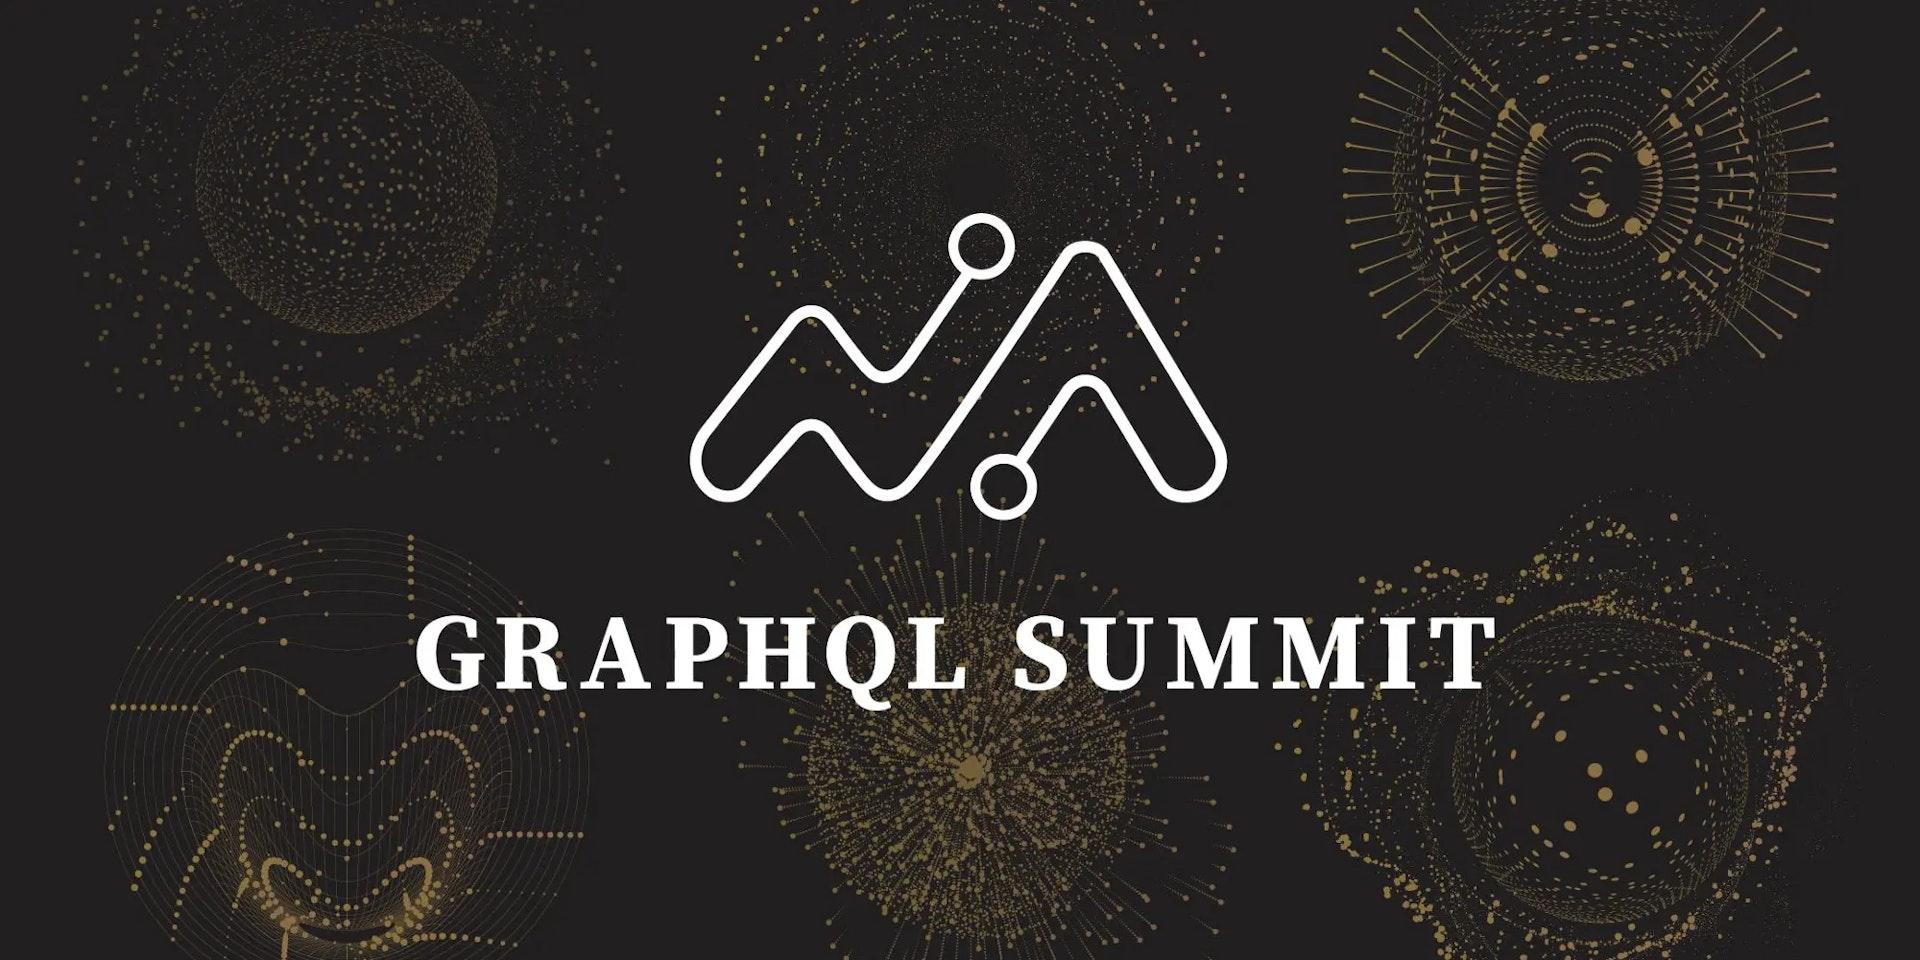 GraphQL Summit 2018: A CTO's Perspective